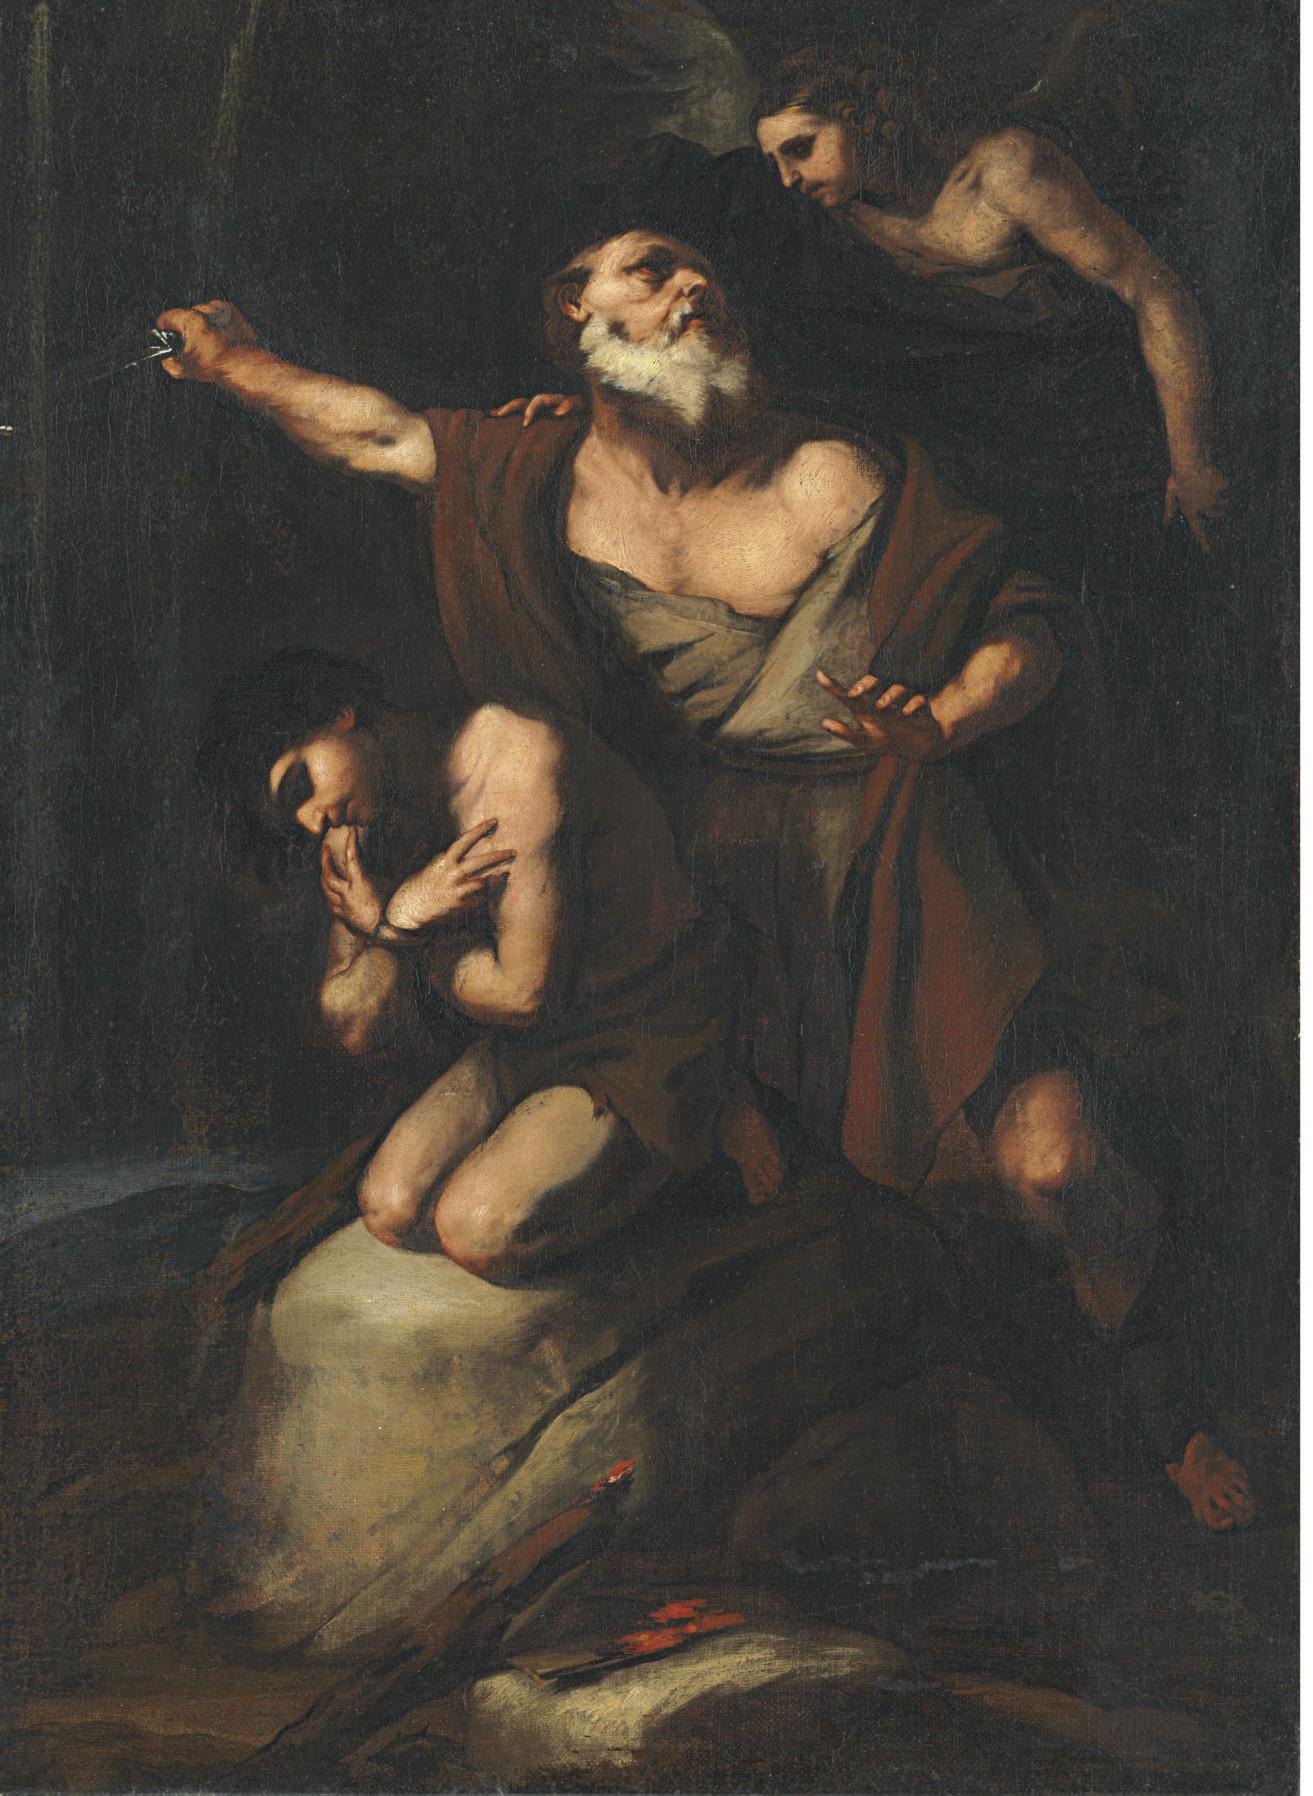 Luca Giordano Naples 1634-1705